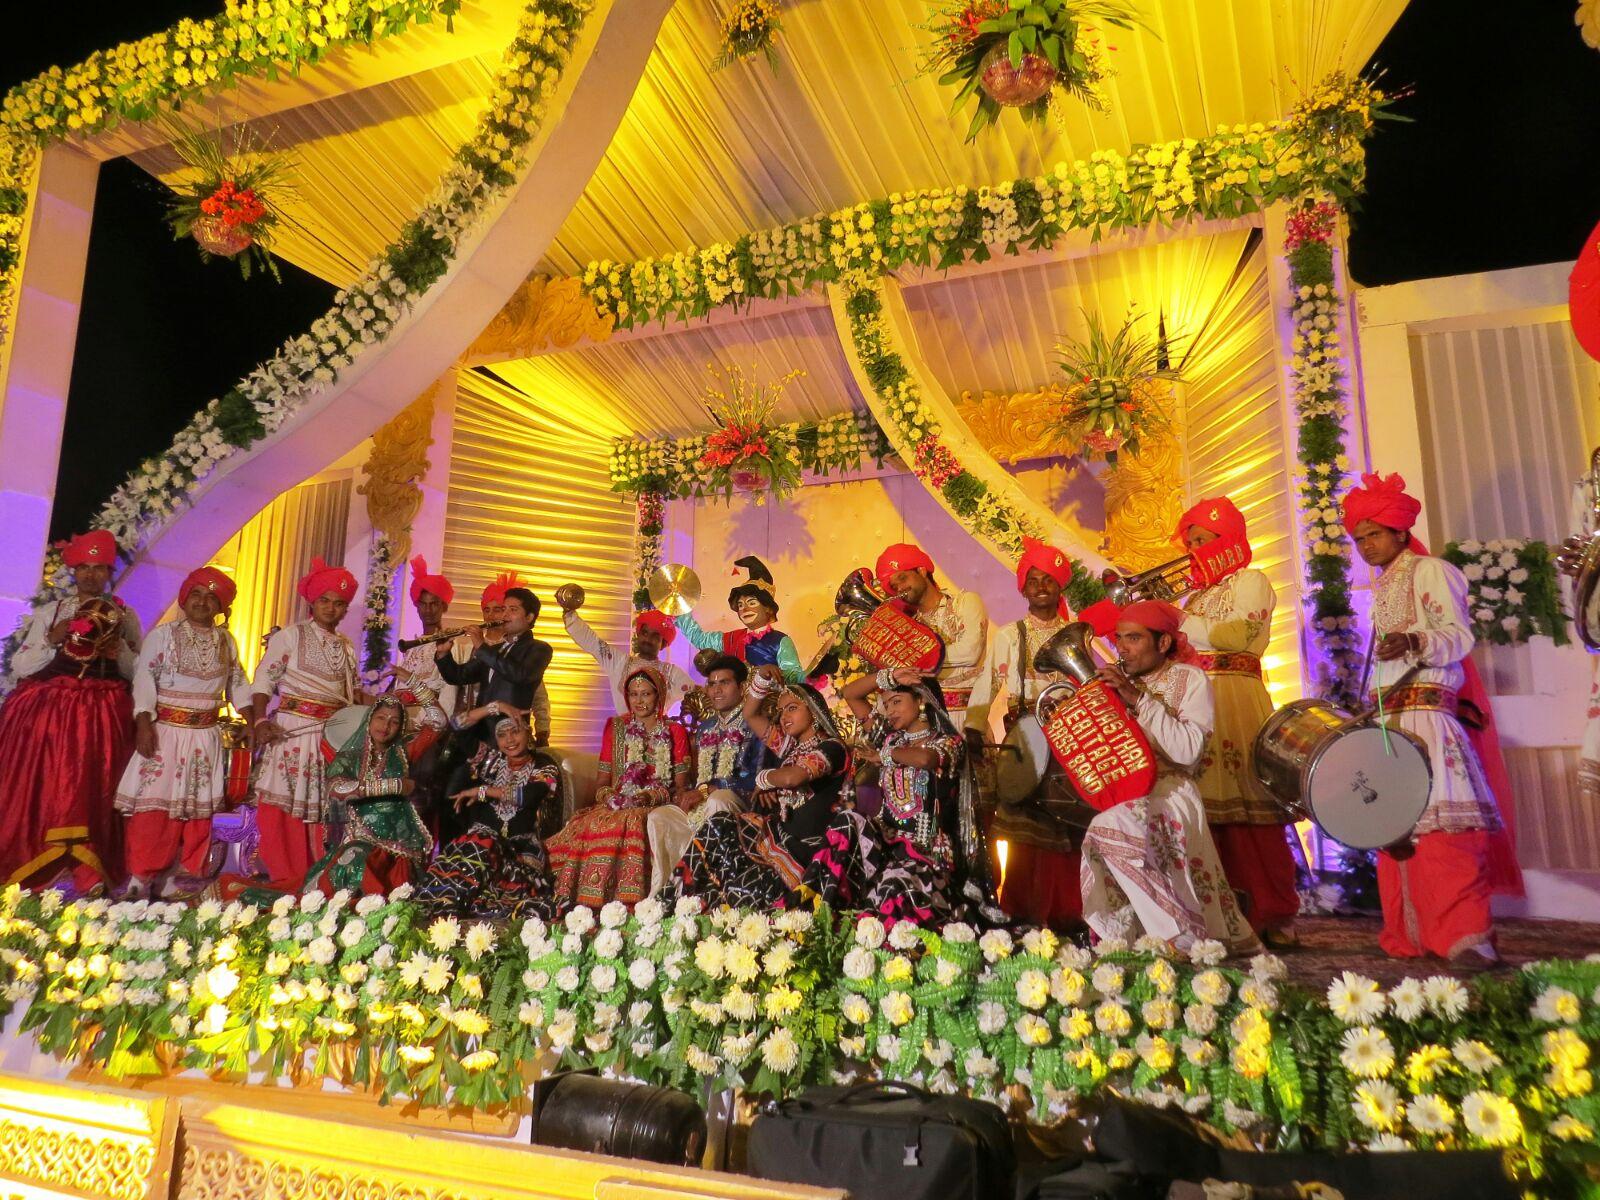 Rajasthan's elite brass band visit Cornerstone, Didcot on 16 September